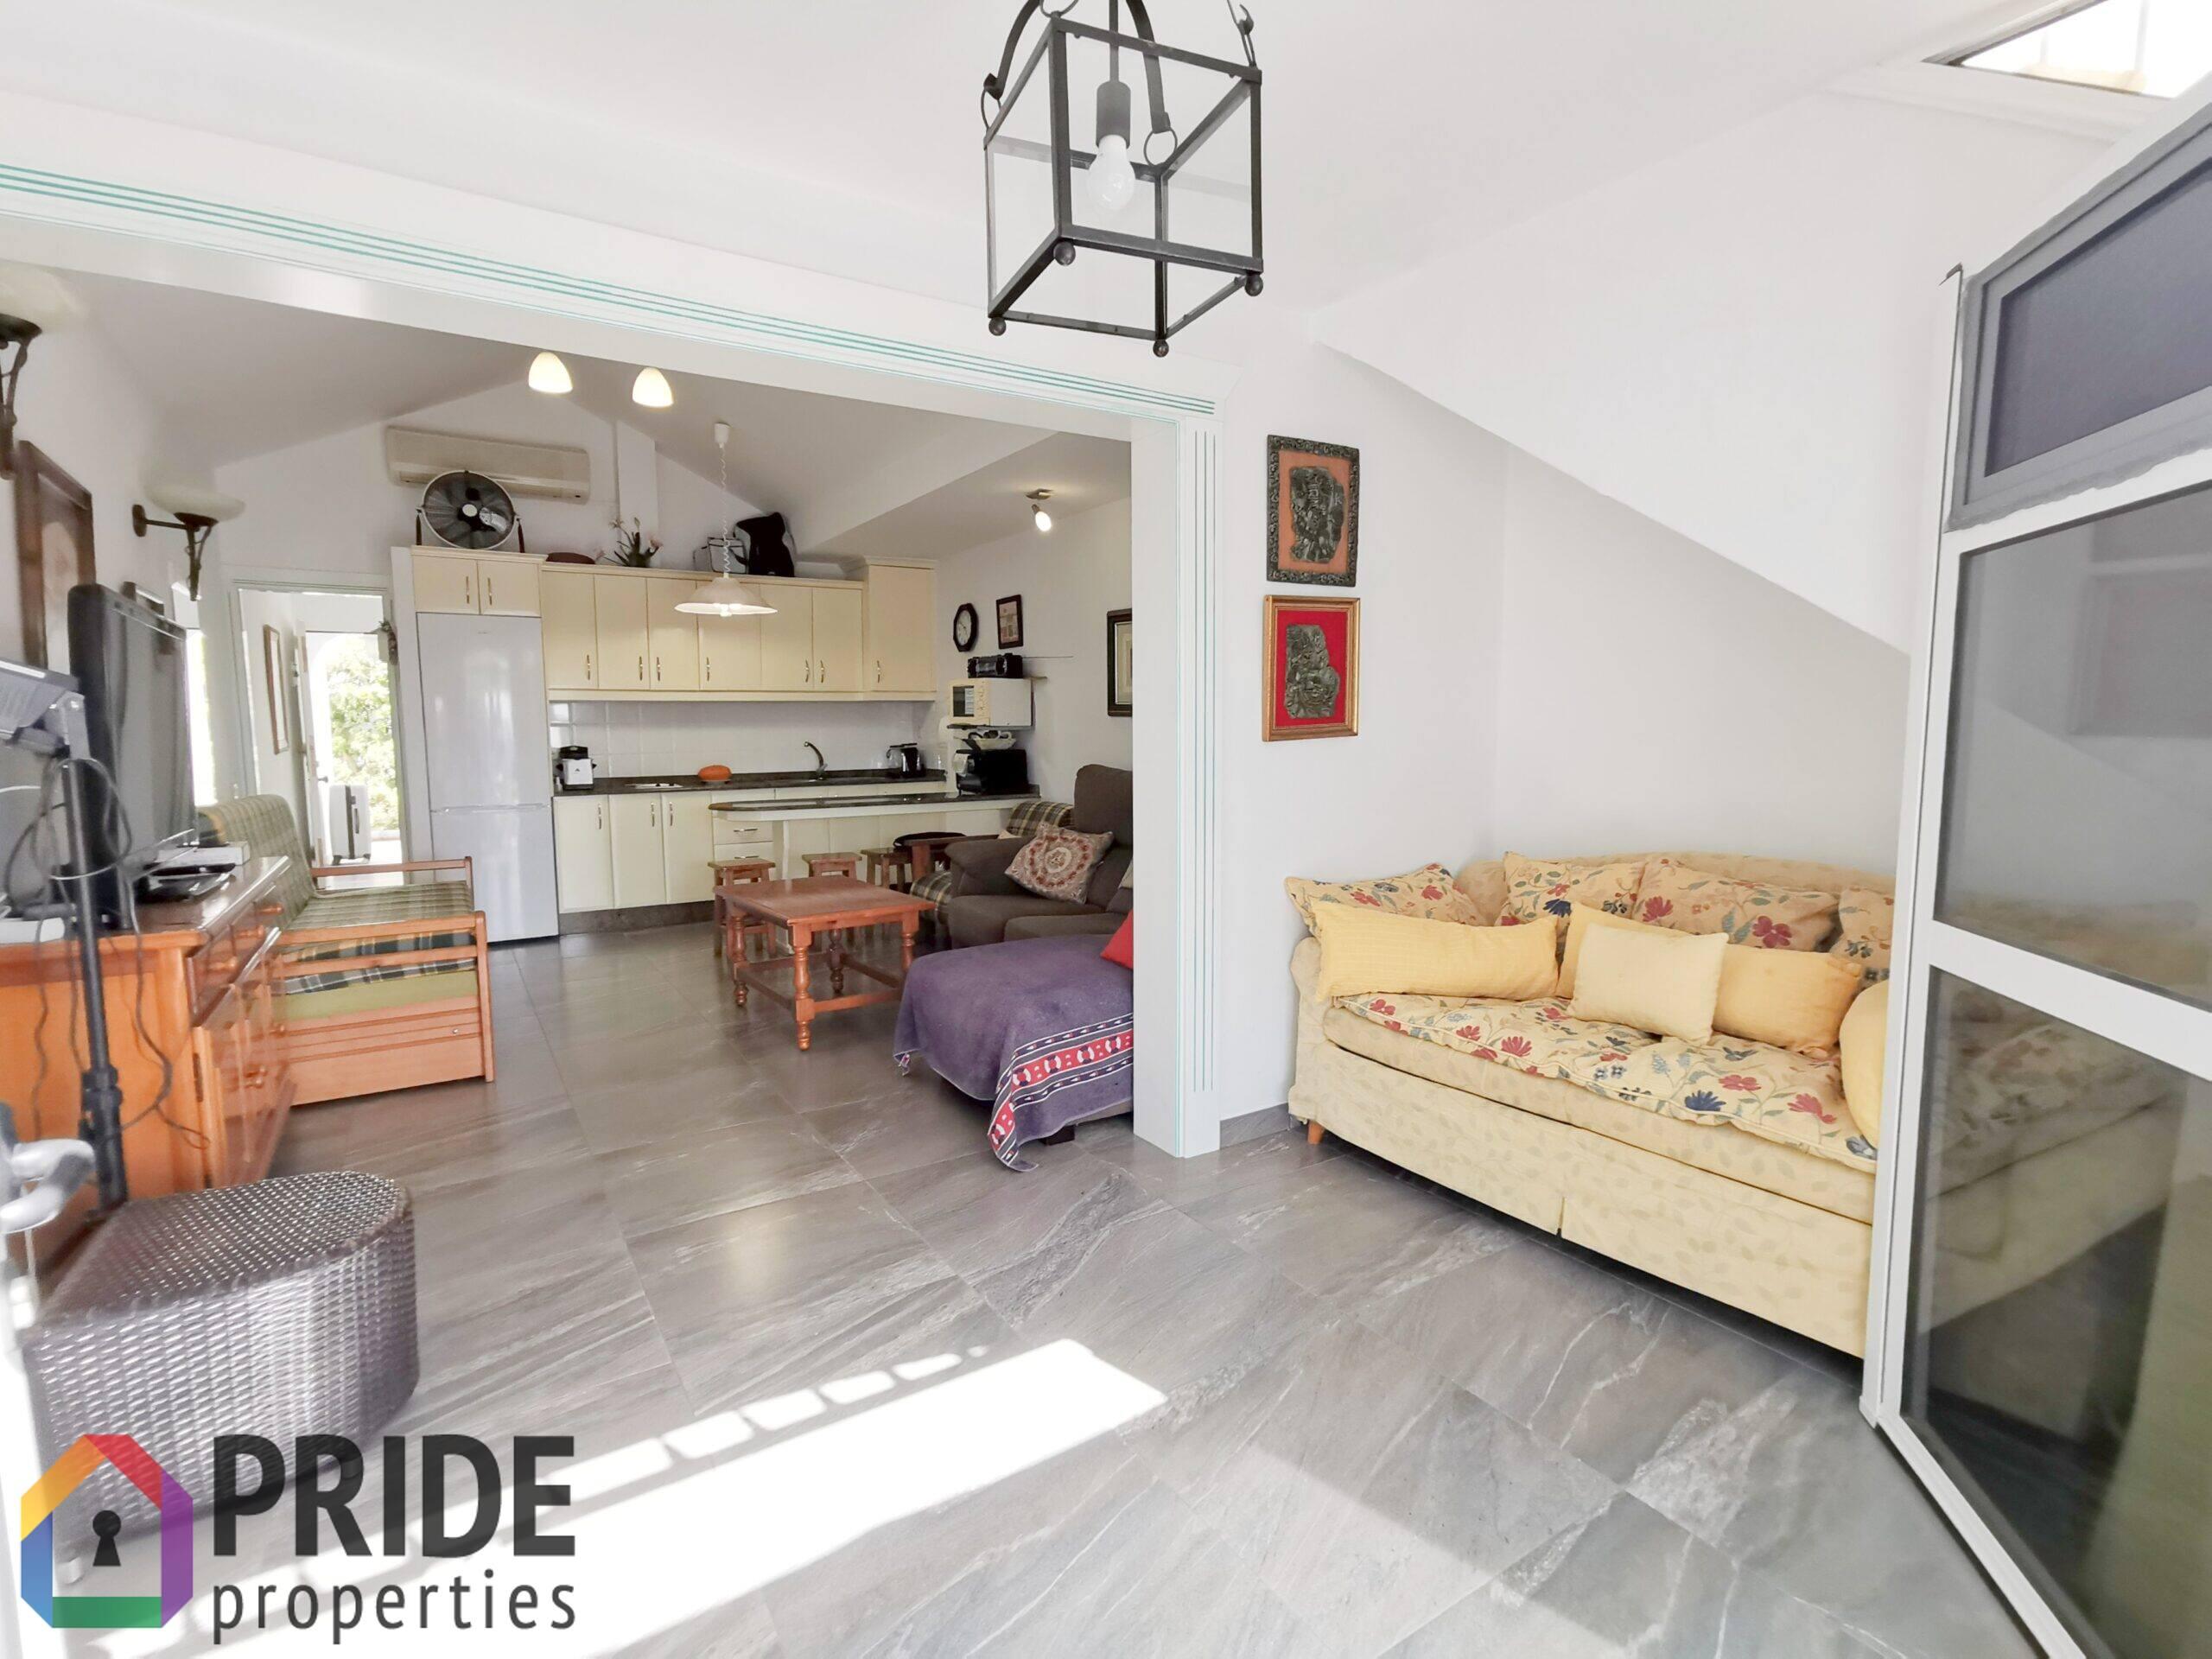 Lovely 1 bedroom bungalow Playa del Ingles